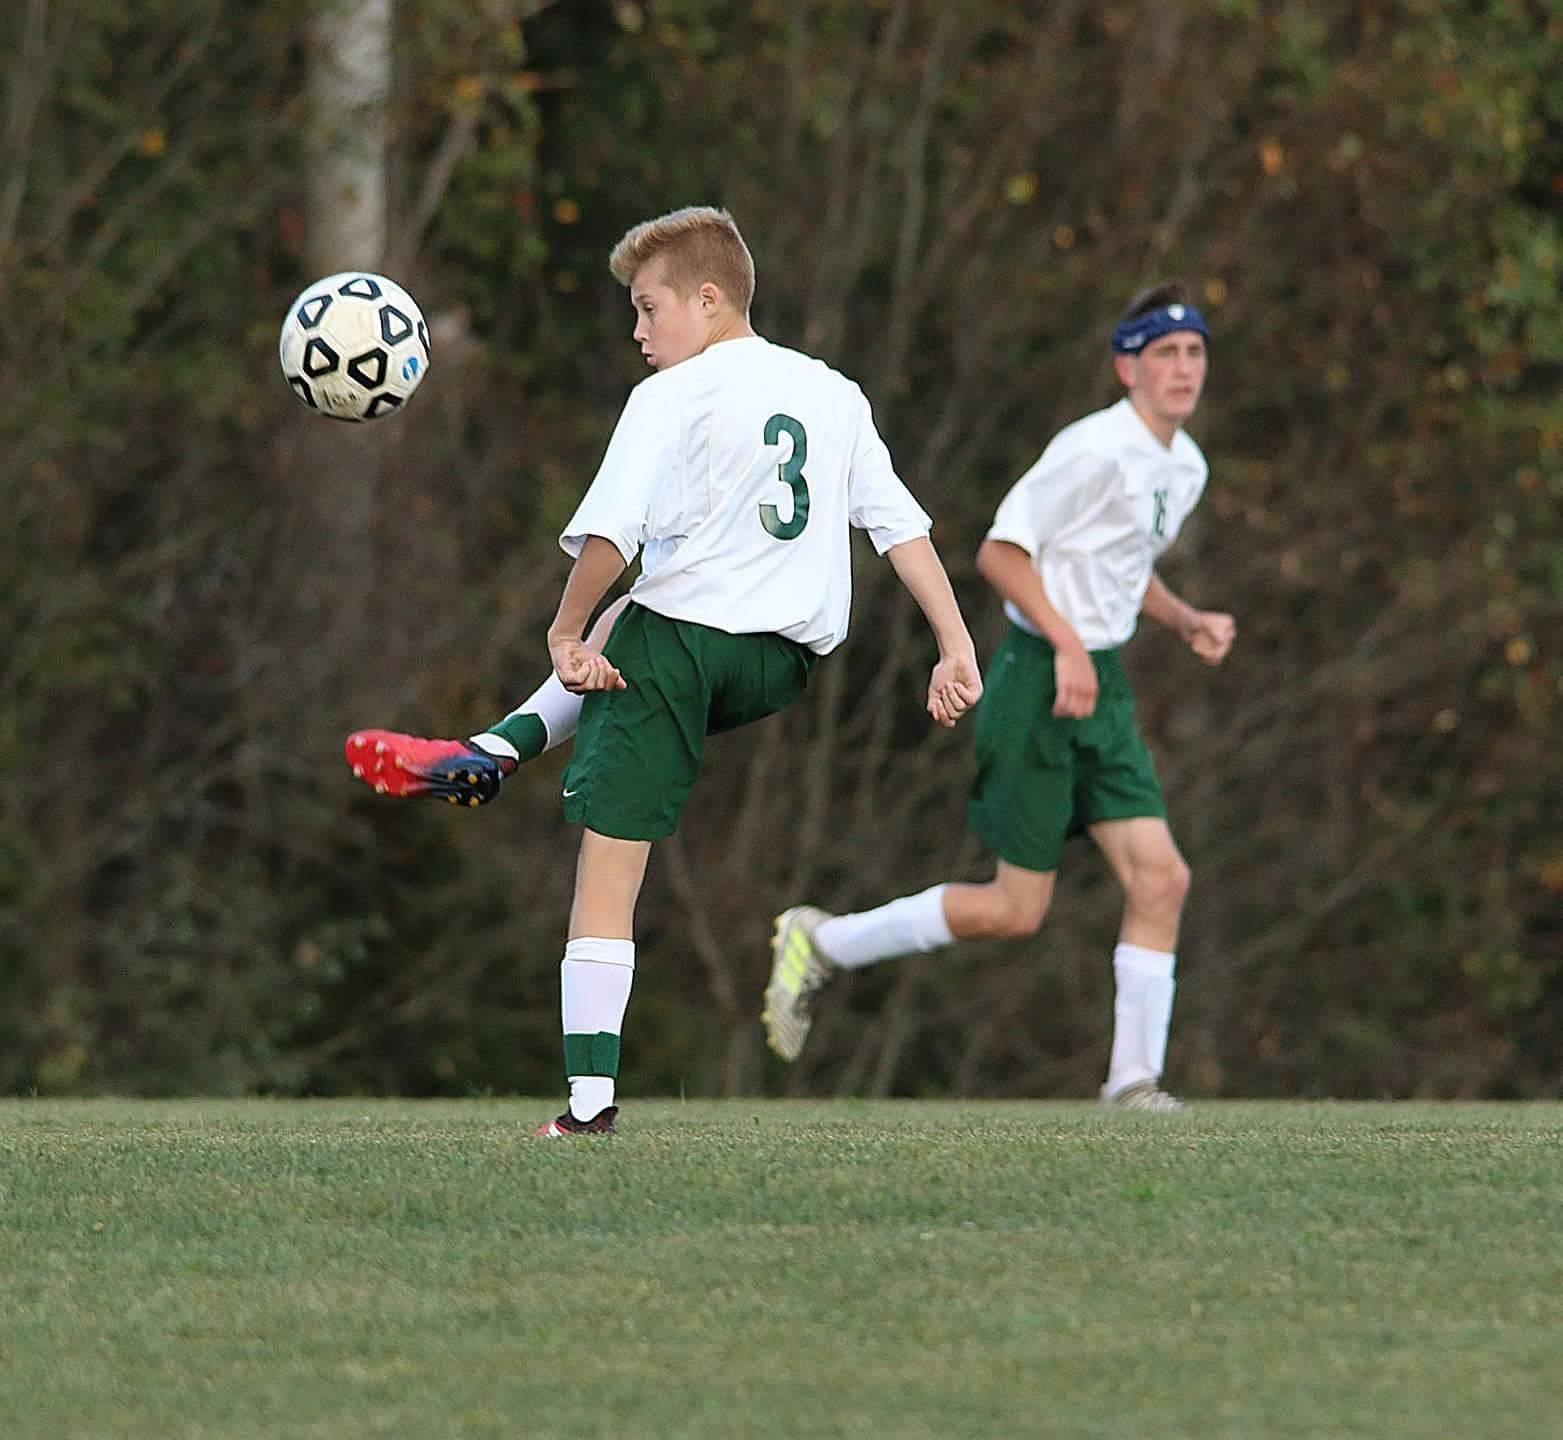 8th grade boy kicking a soccer ball during a game